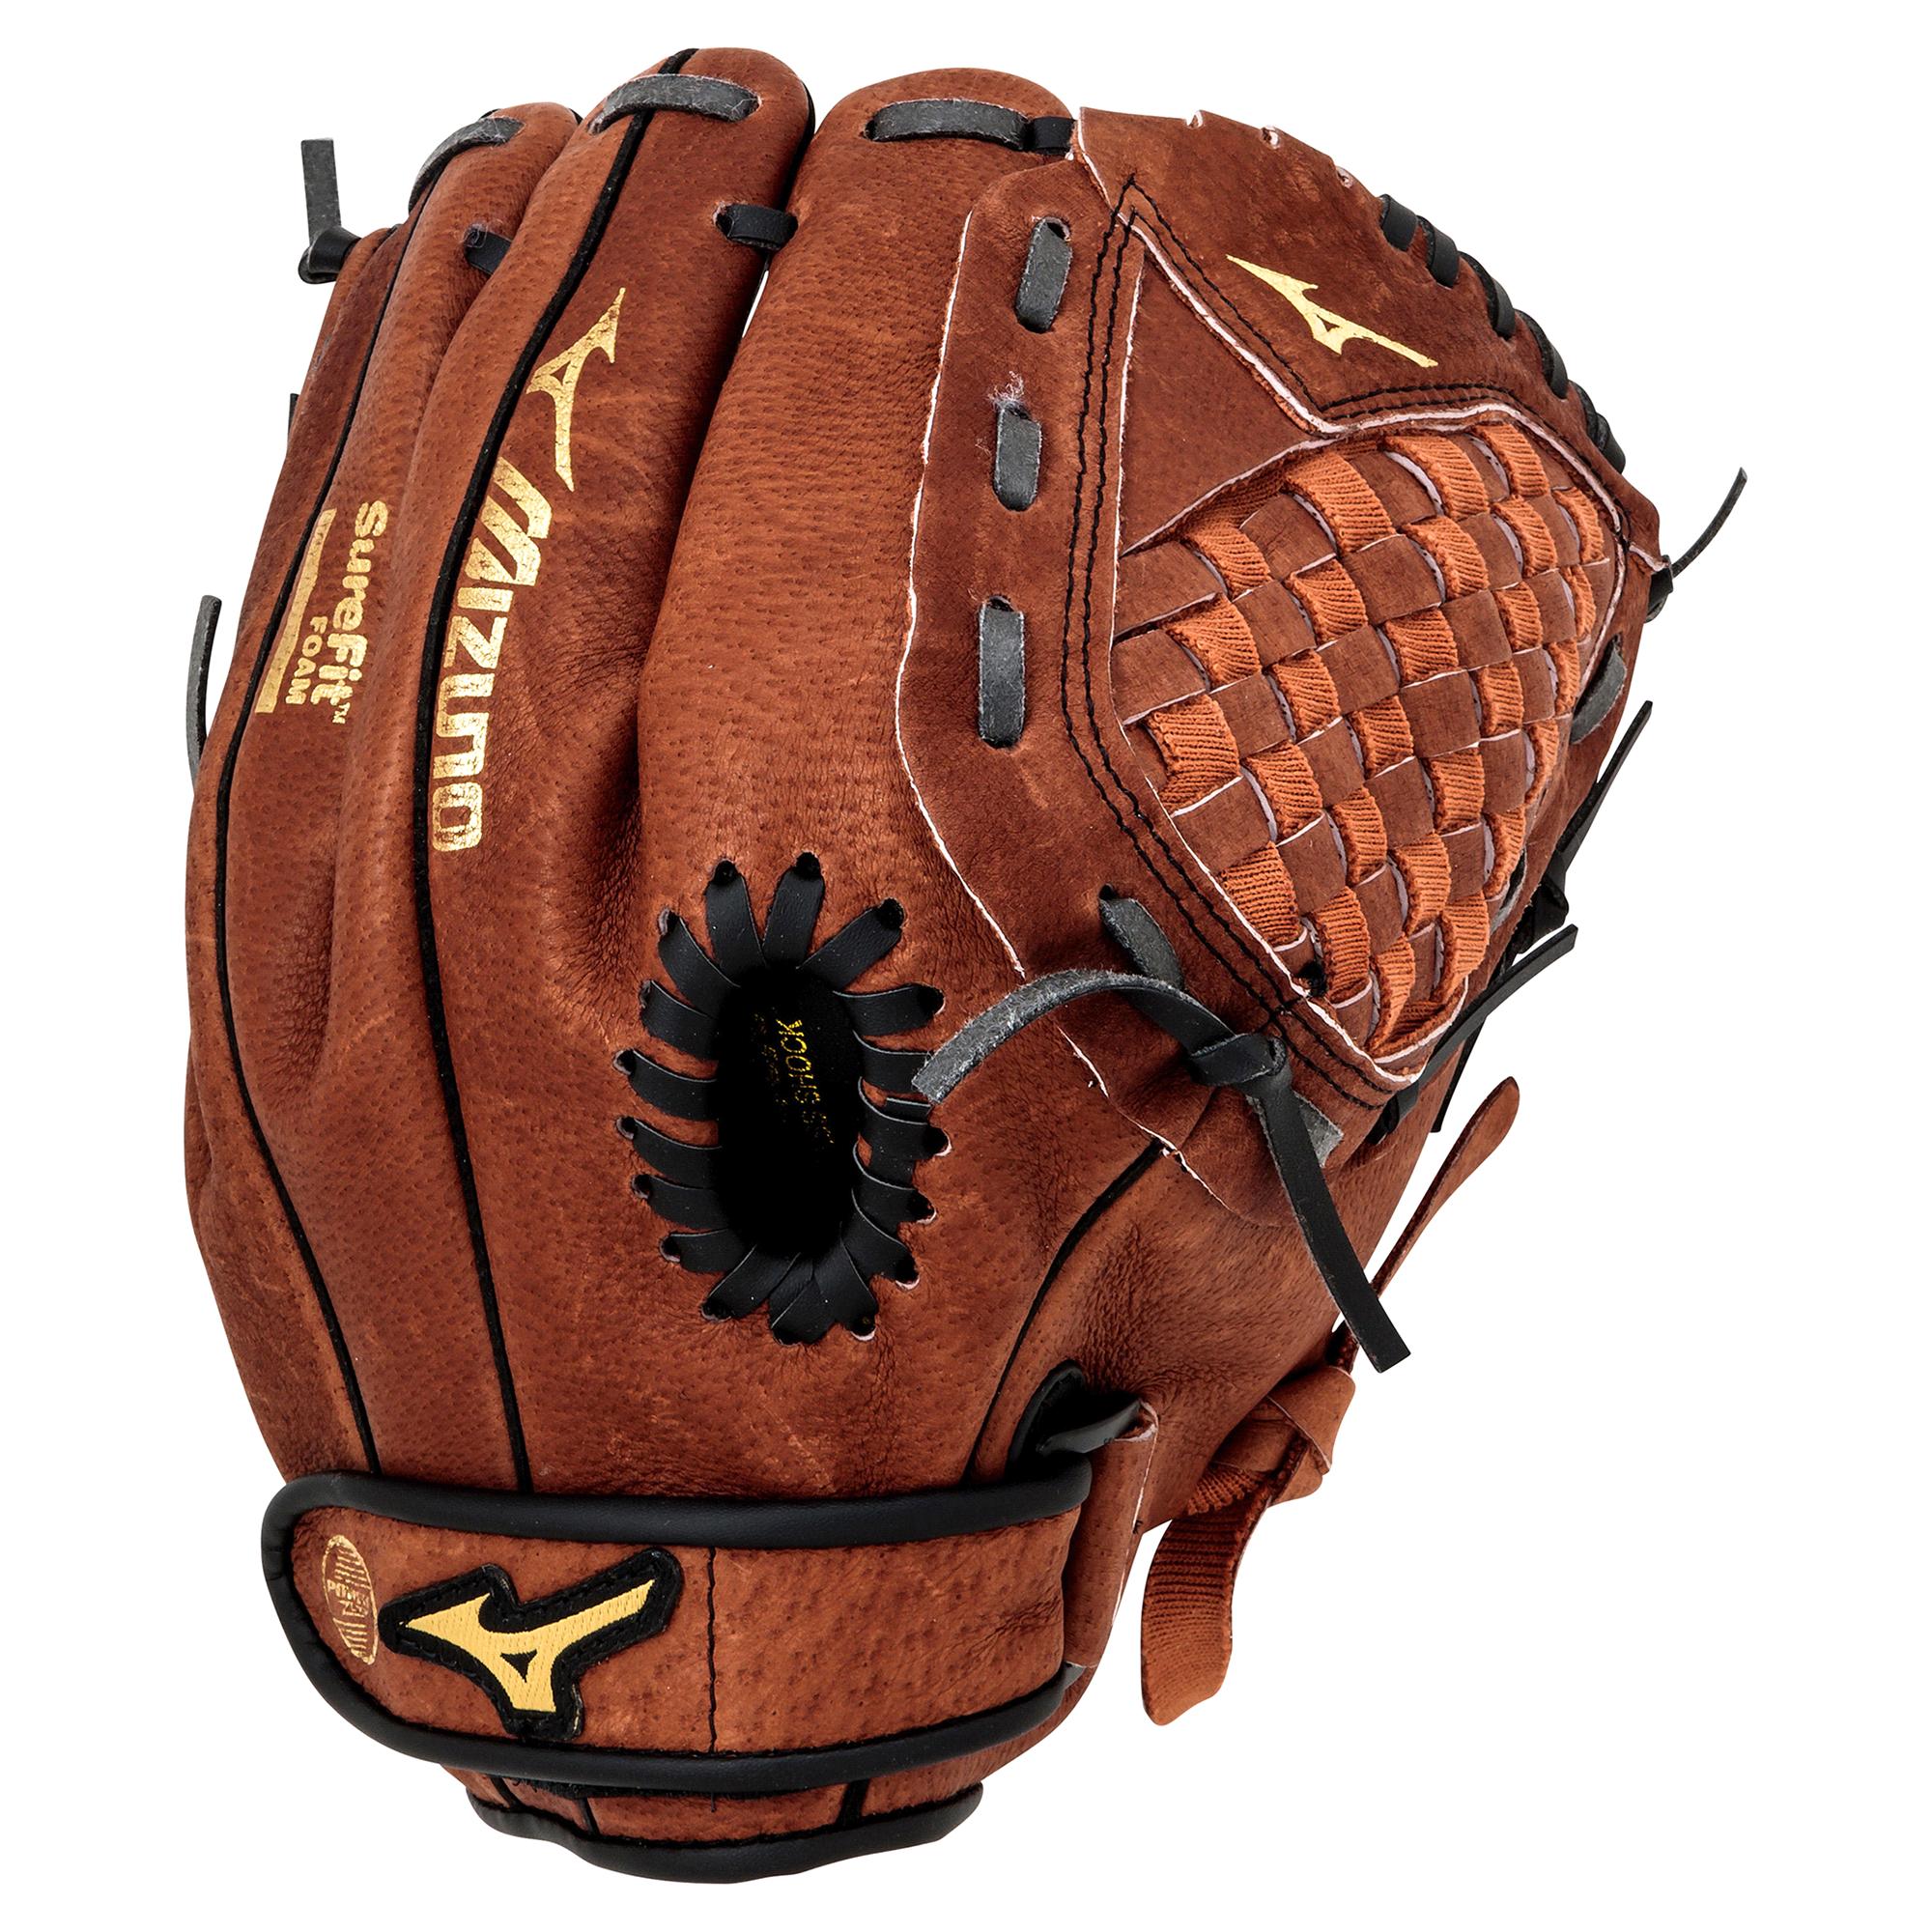 Baseball Mitt Bean Bag Chair -